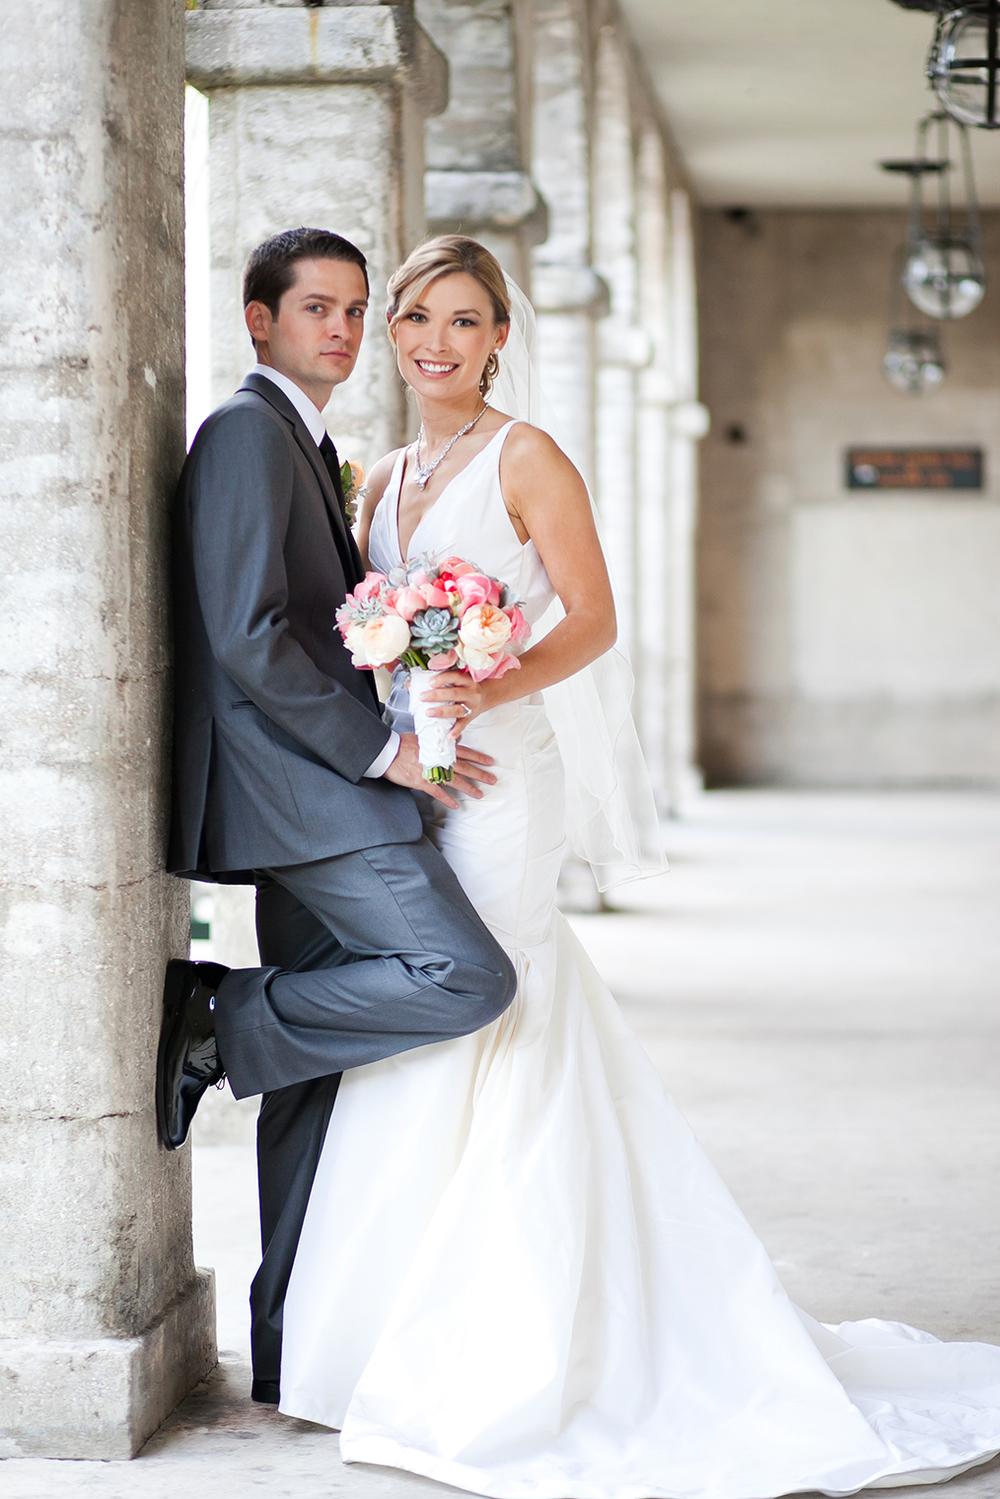 adam-szarmack-st-augustine-wedding-photographer-whiteroom-IMG_3831.jpg